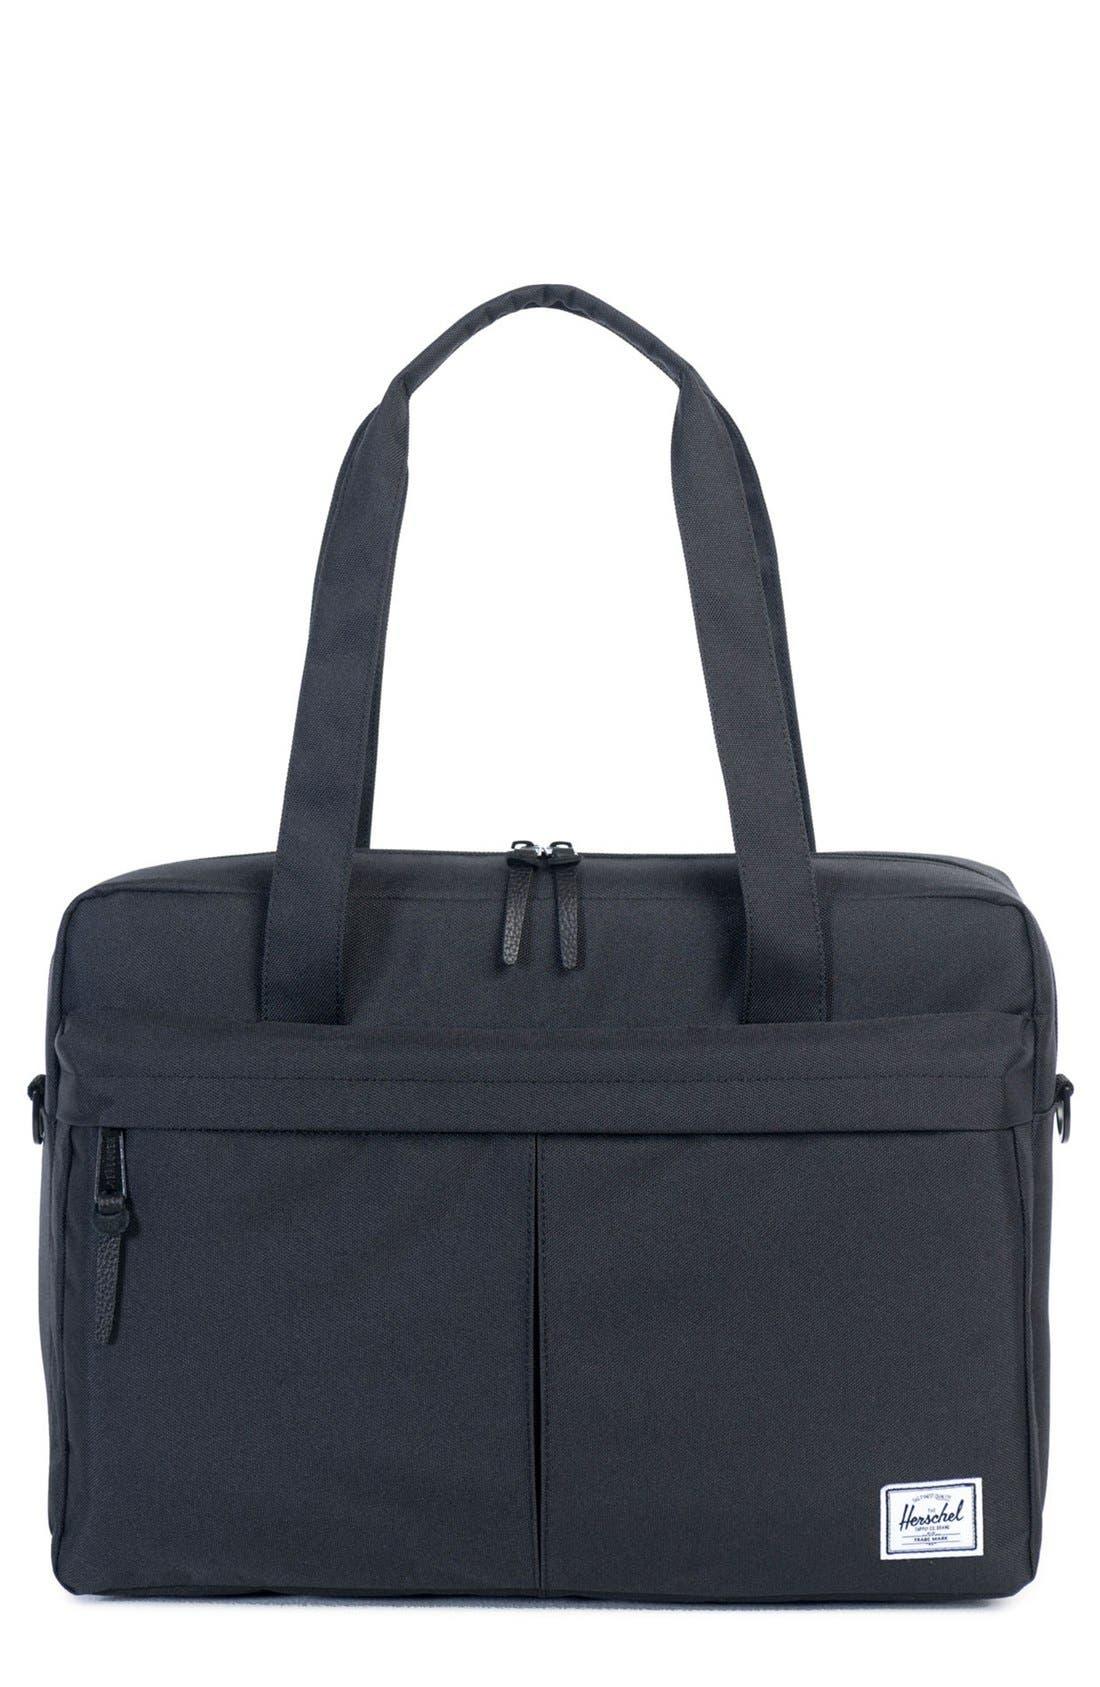 'Gibson' Messenger Bag,                         Main,                         color, 001